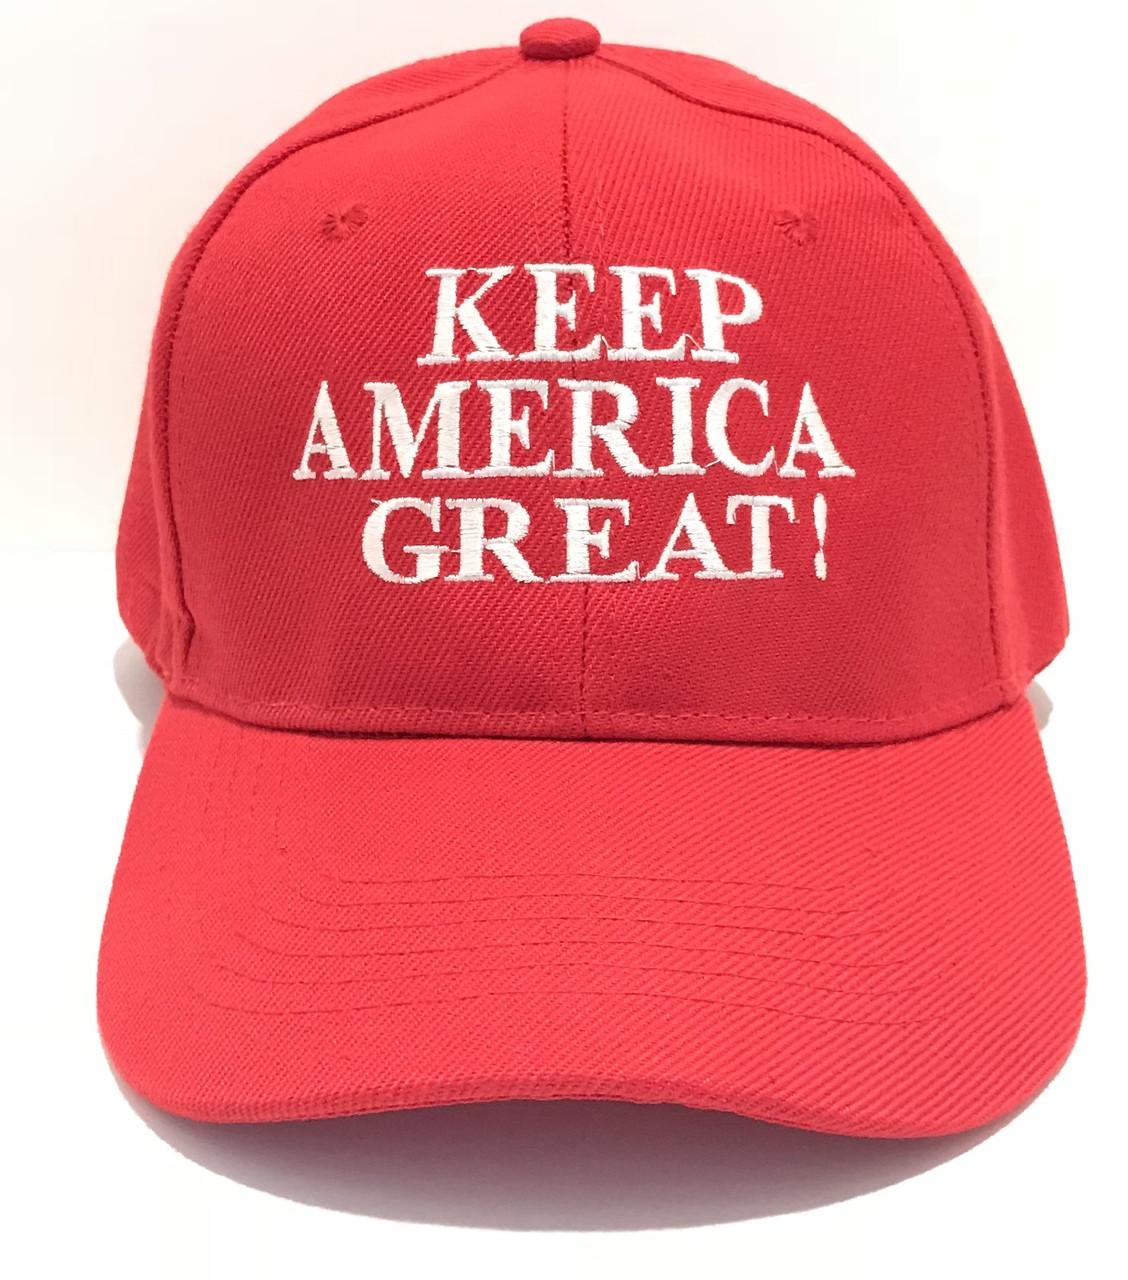 KEEP AMERICA GREAT! - PRESIDENT DONALD TRUMP 2020 ELECTION - Ball ... d876aee6d3b